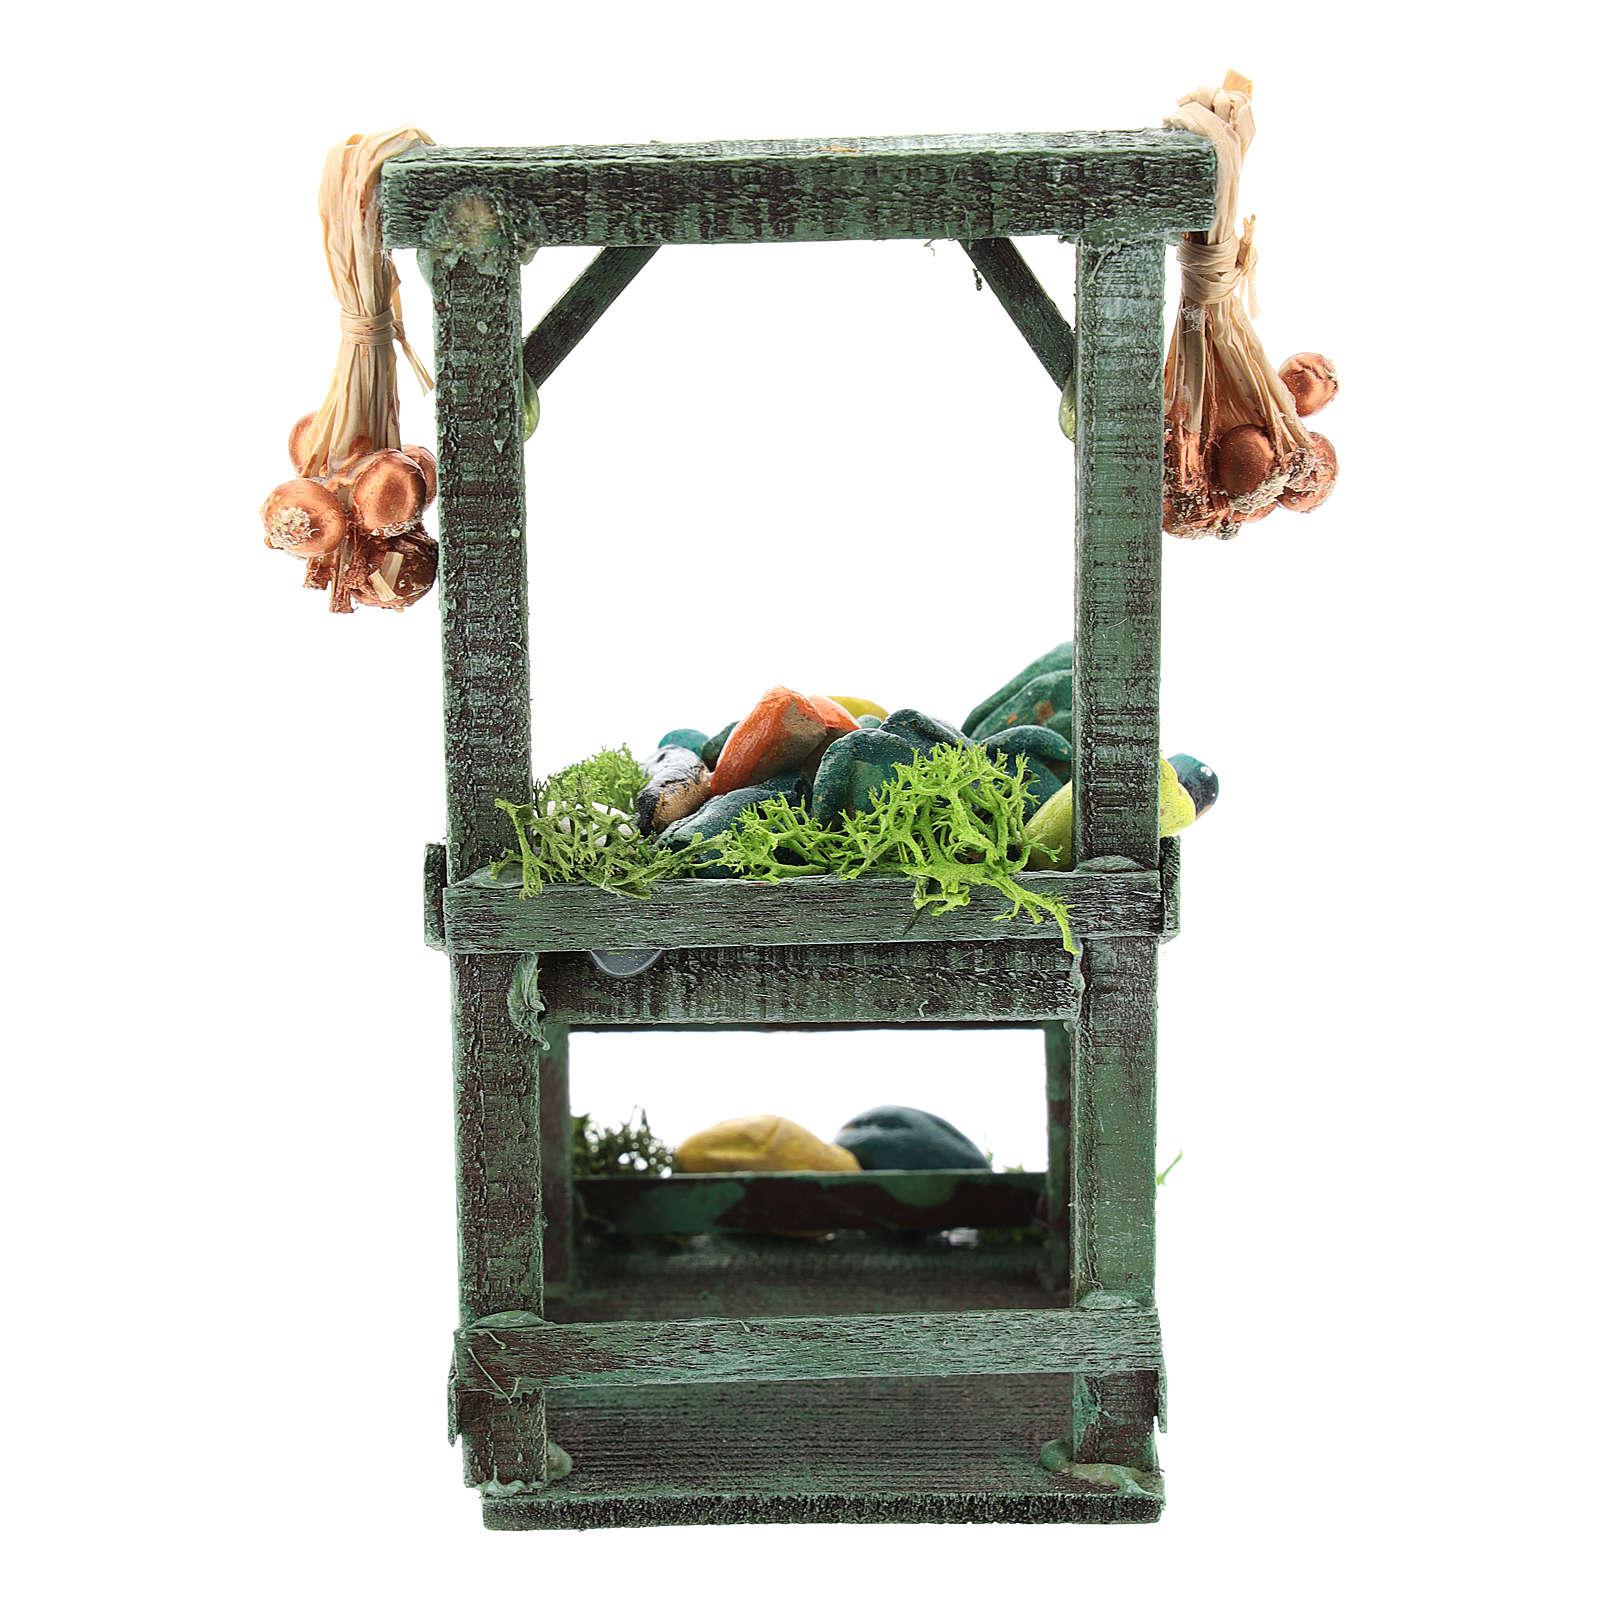 Titled vegetable stand for Neapolitan Nativity Scene of 6-8 cm 4